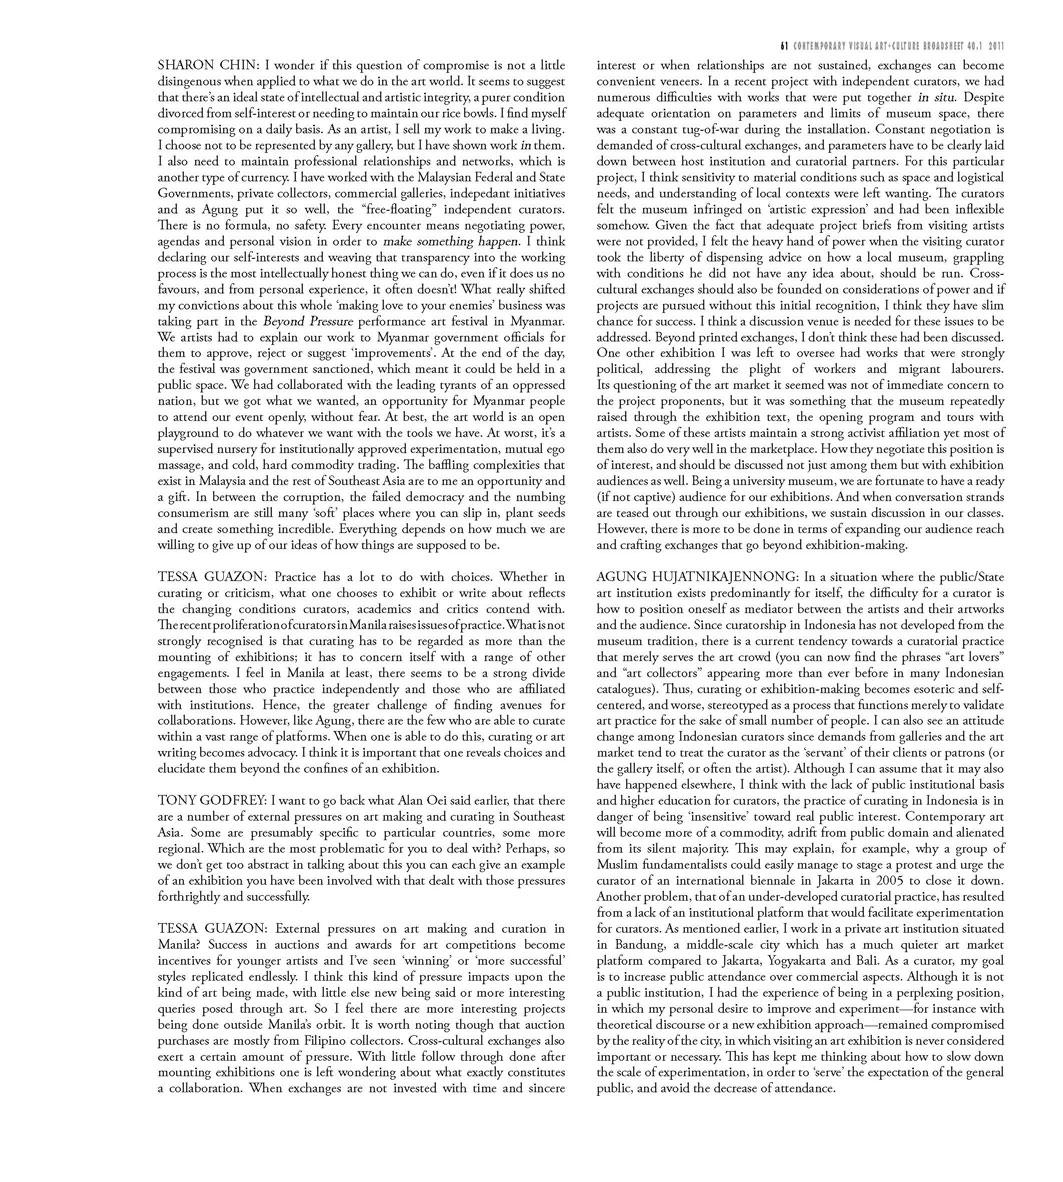 40-1-godfrey_Page_2_o